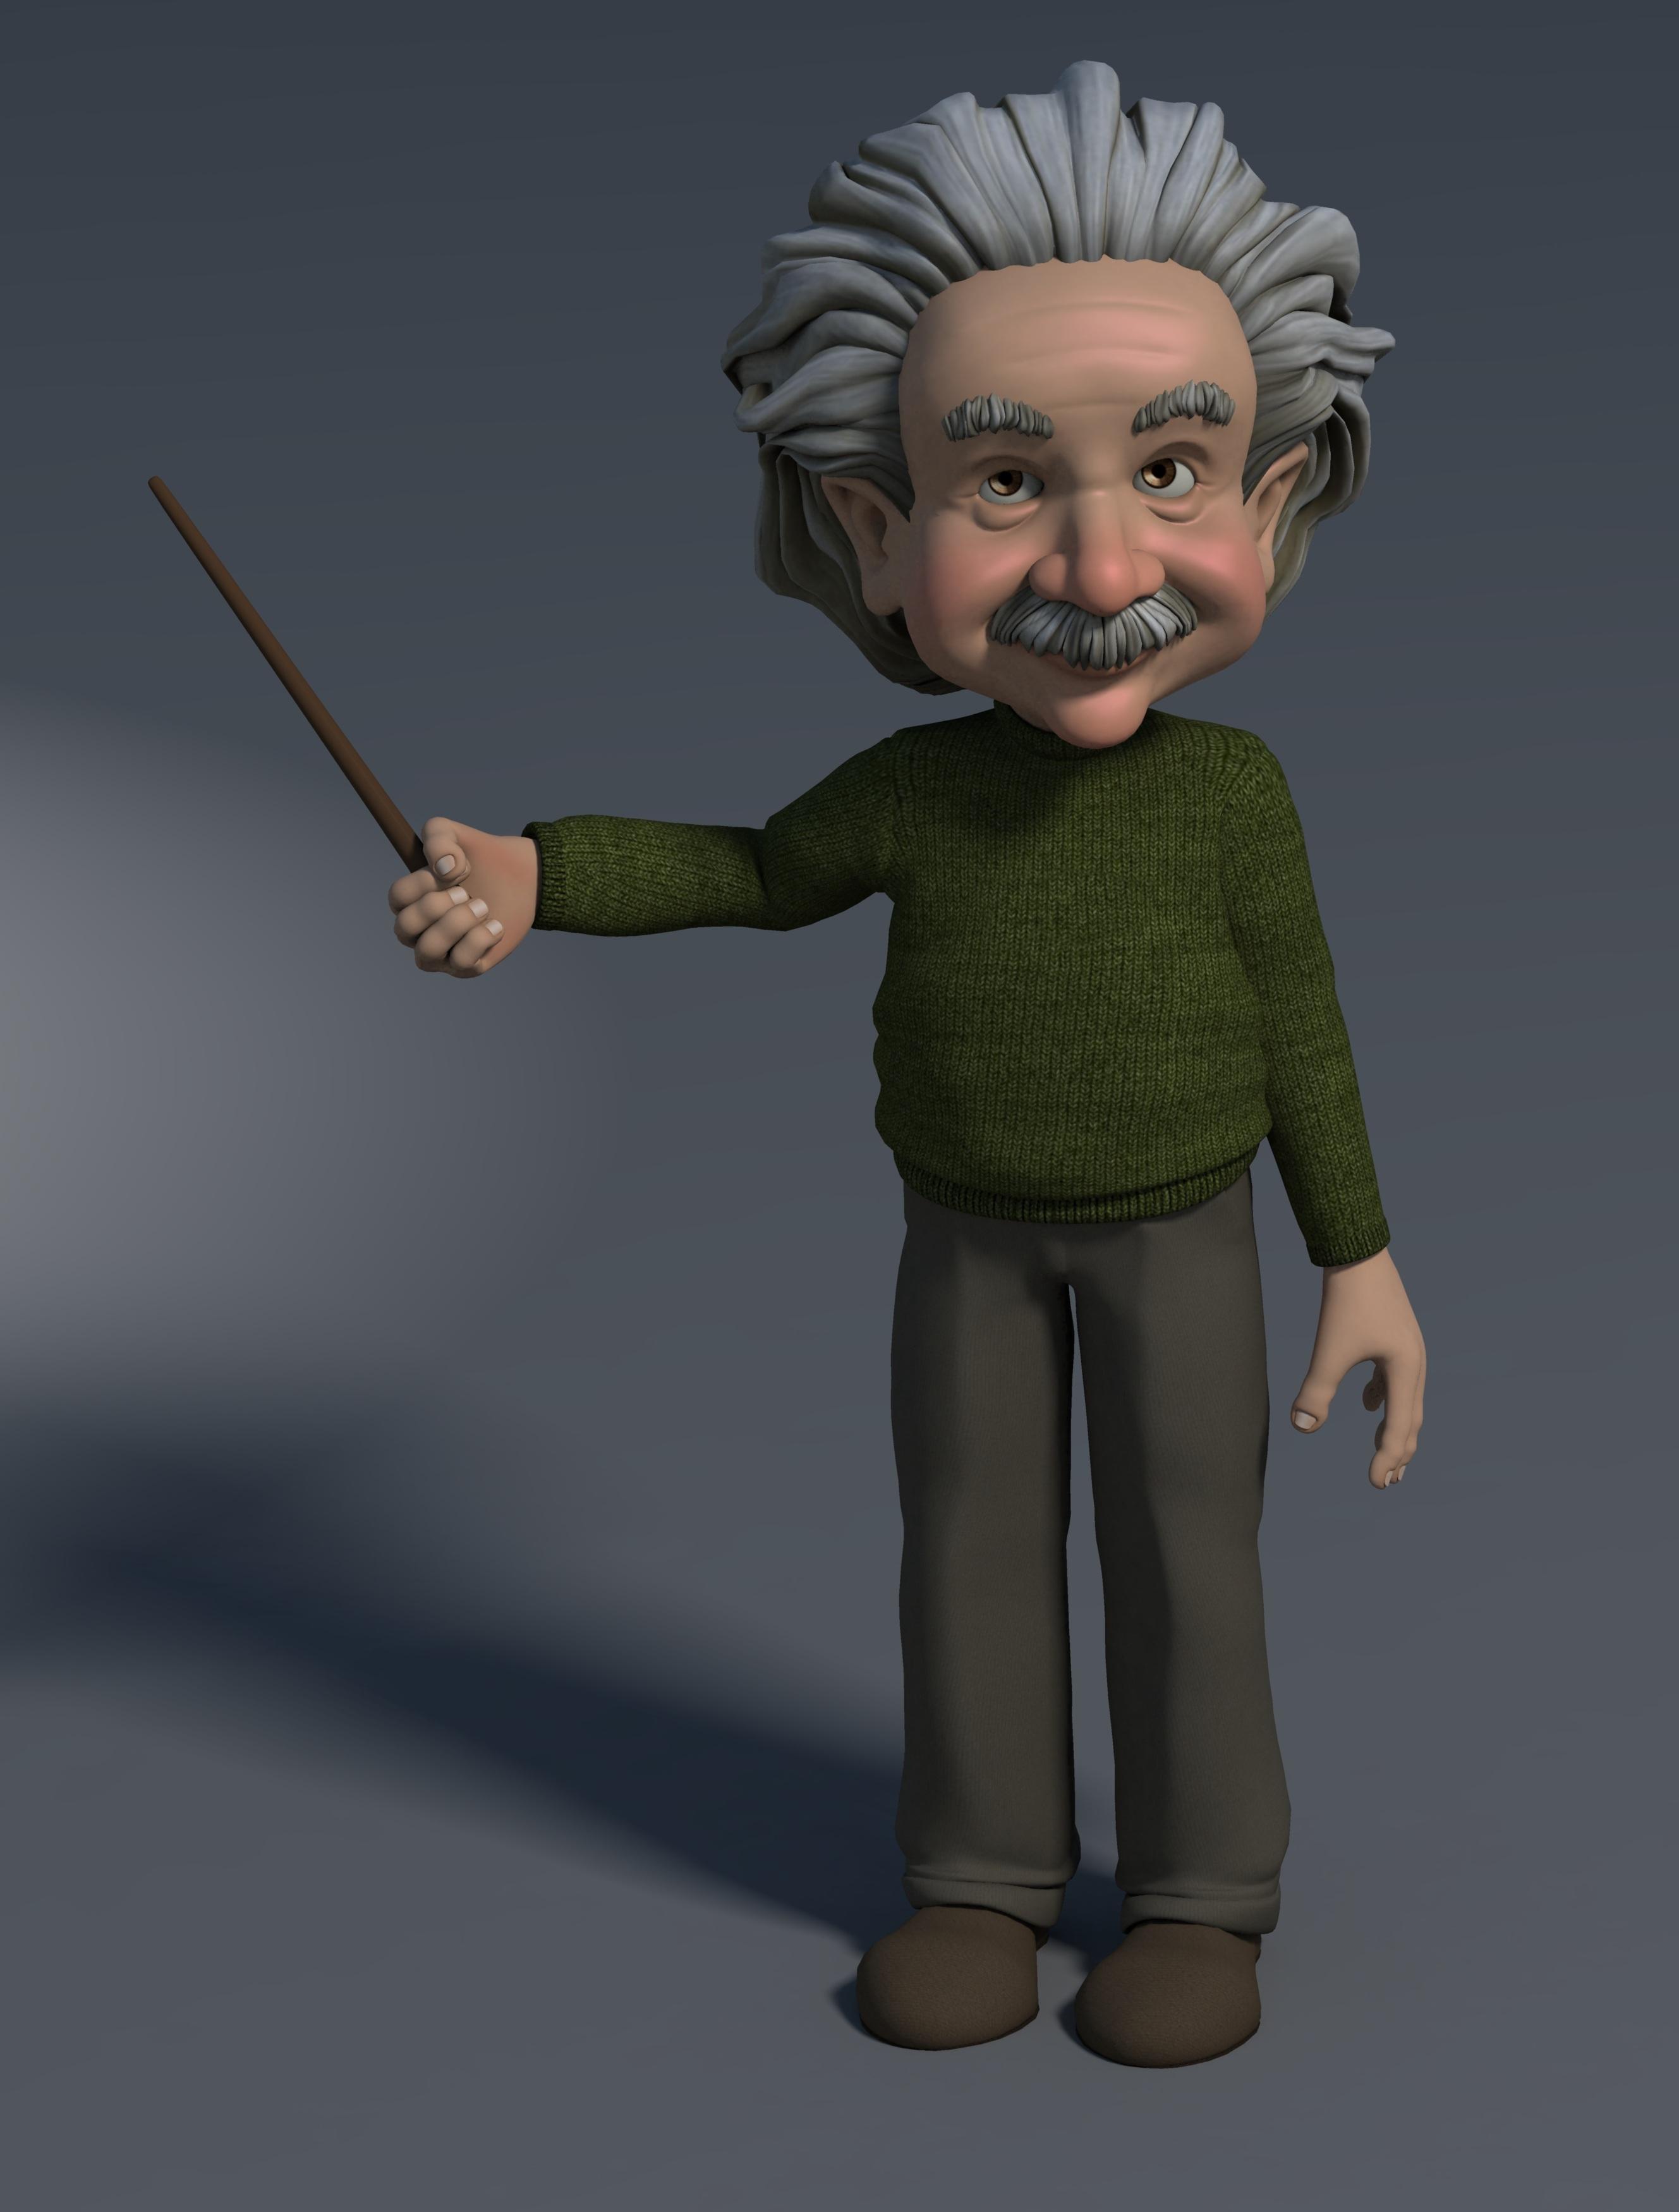 Gambar Orang Pakaian Mainan Ilustrasi Kuliah Menunjukkan